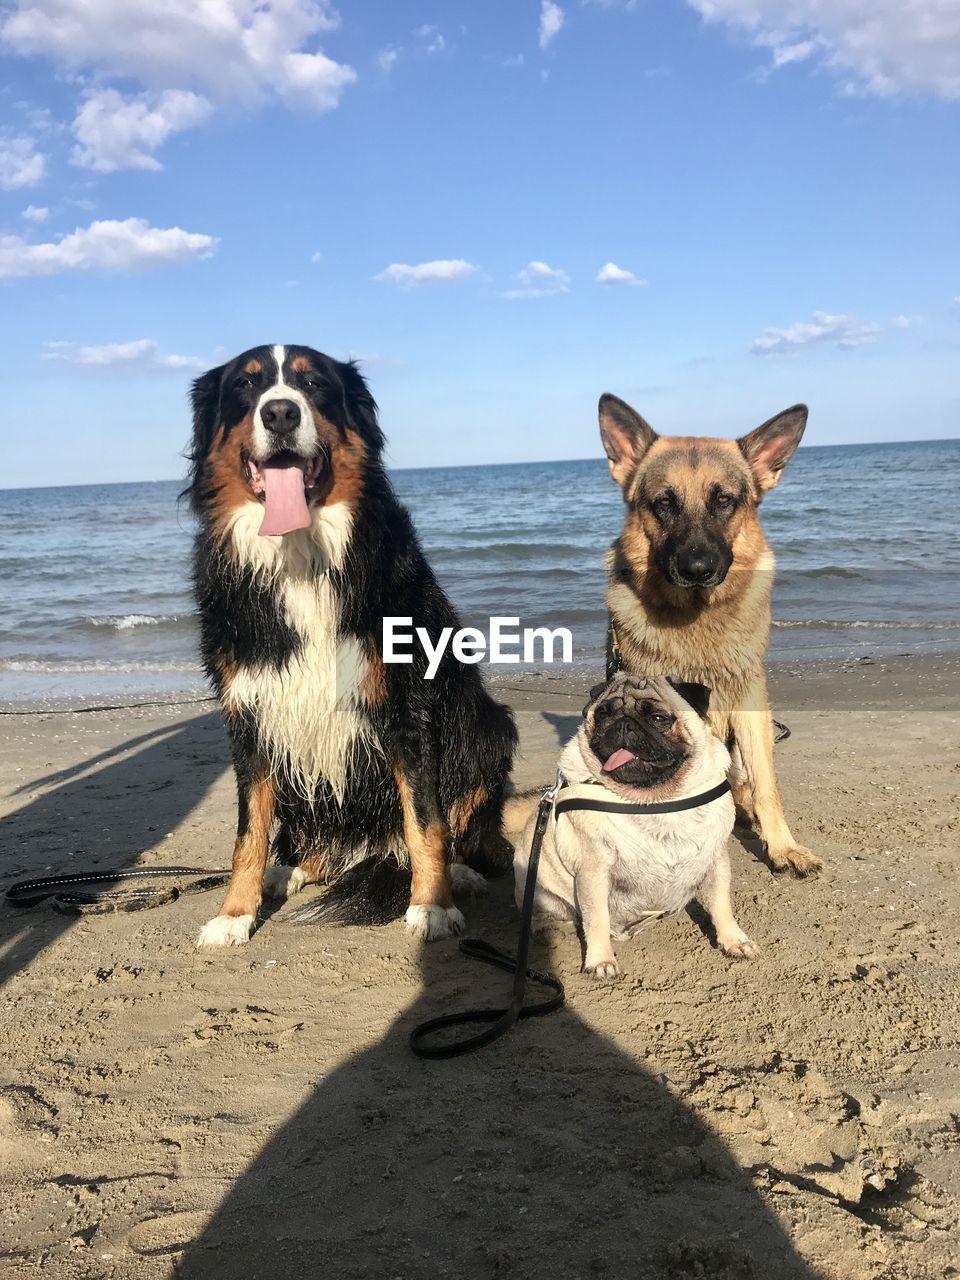 BROWN DOG ON BEACH